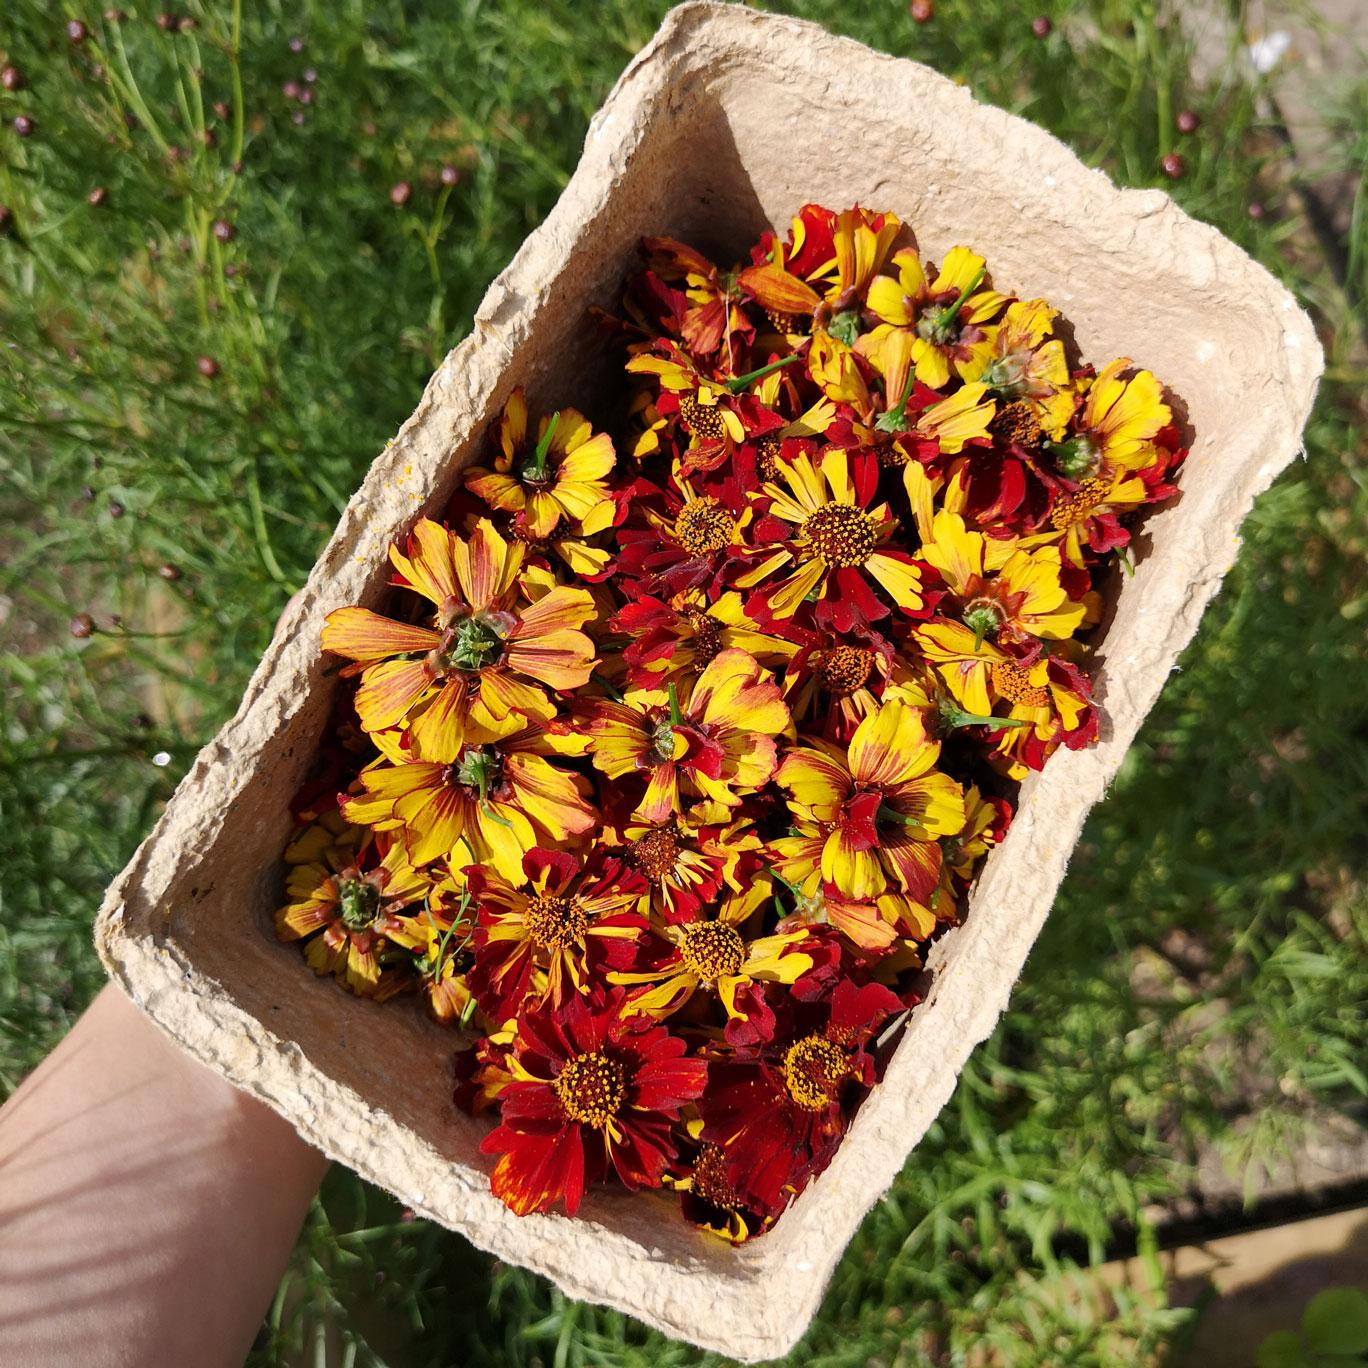 ria-burns-knitwear-coreopsis-tinctoria-roulette-flower-dye-1.jpg